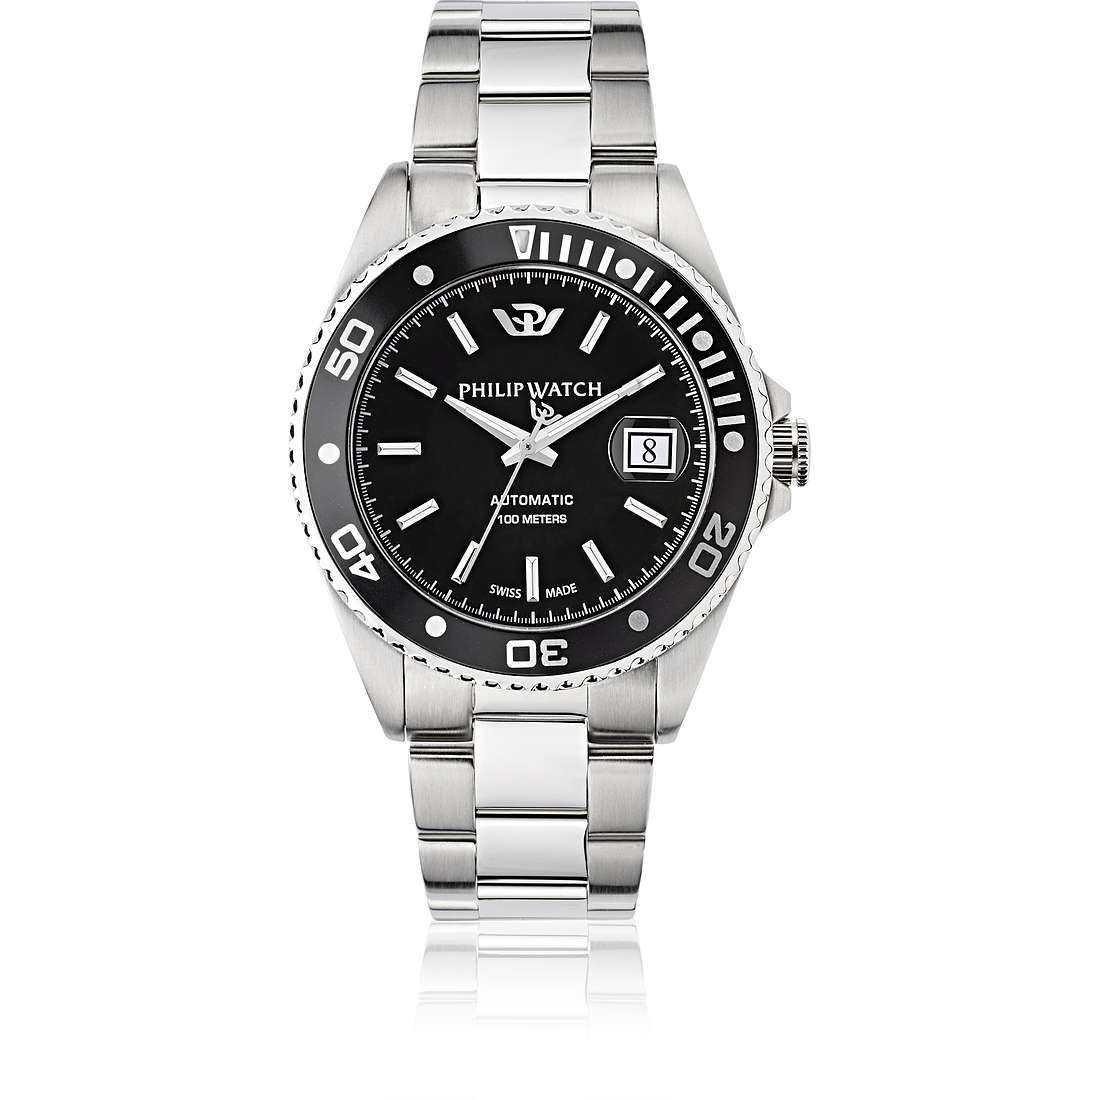 Orologio philip watch r8223597010